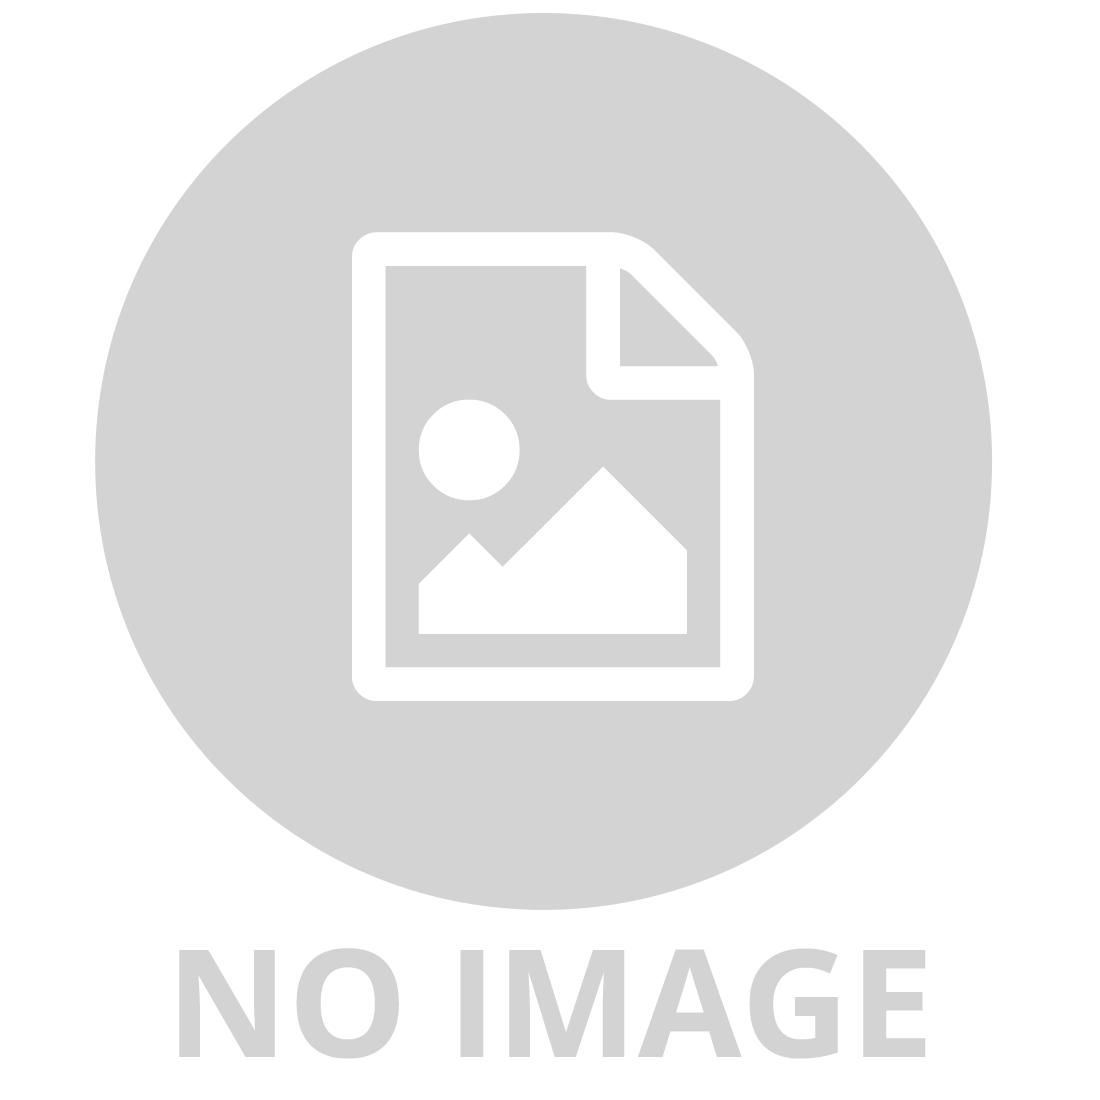 LEGO FRIENDS 41413 MIA'S SUMMER PLAY CUBE